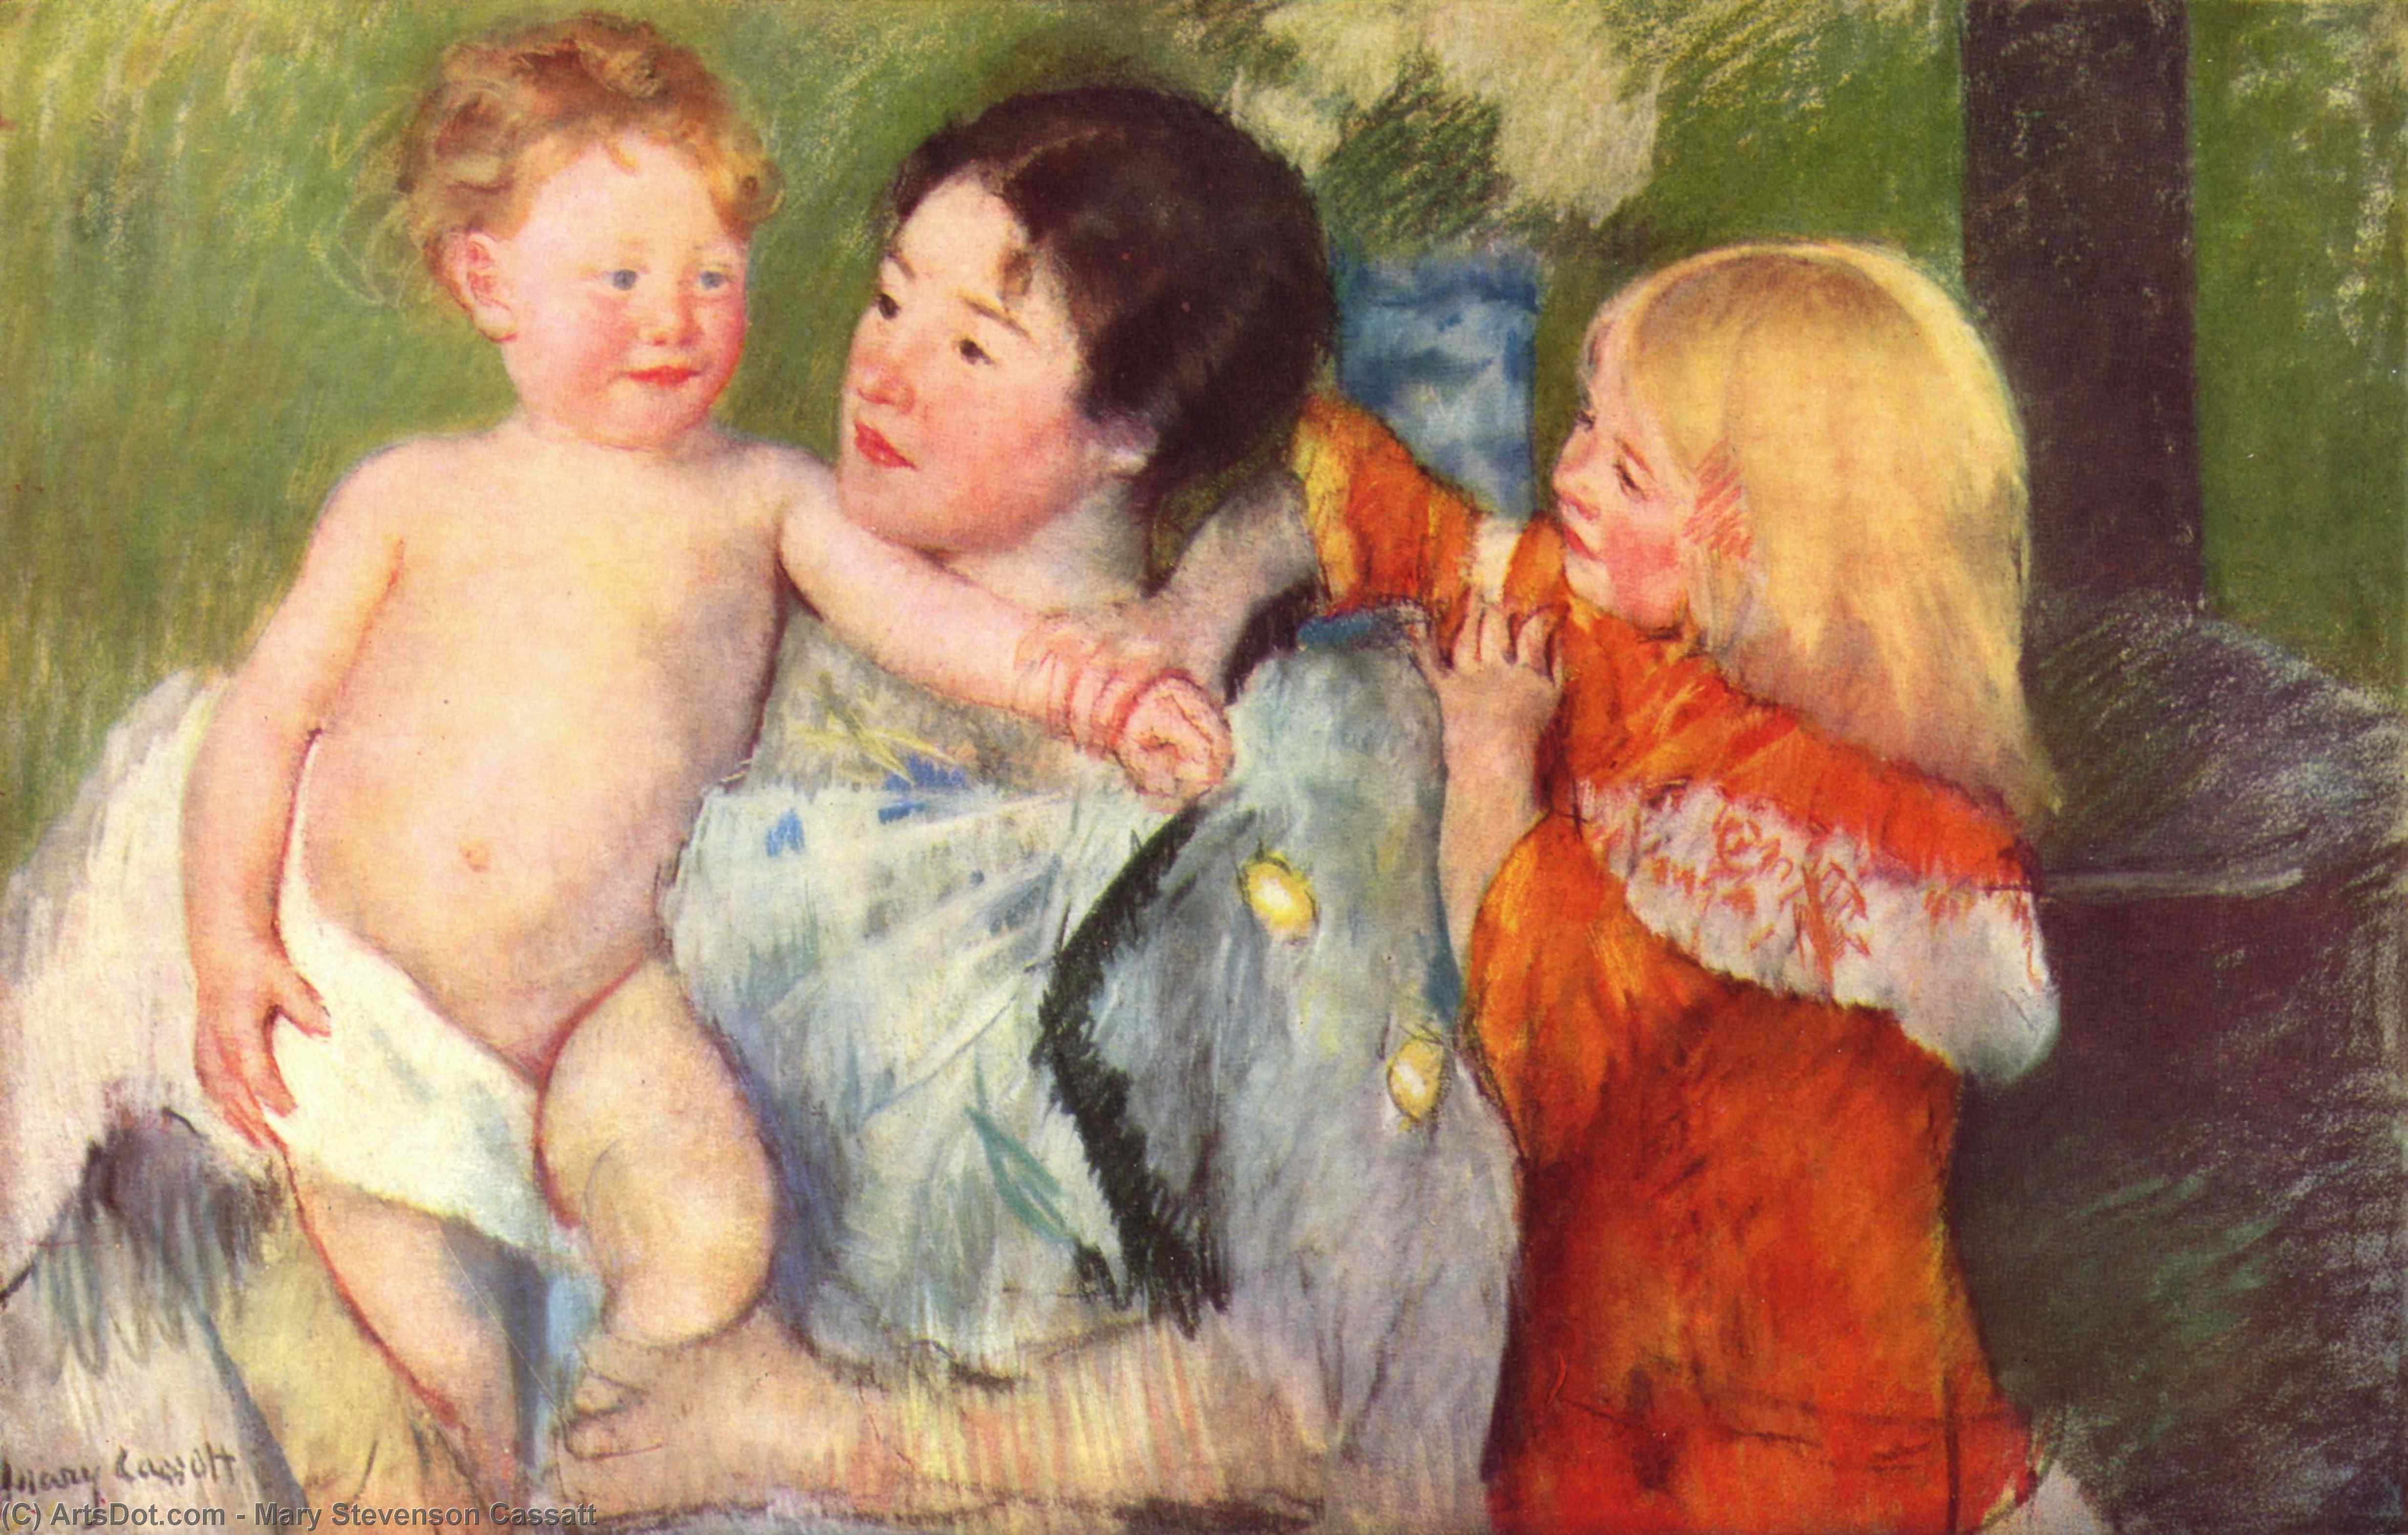 Wikioo.org - สารานุกรมวิจิตรศิลป์ - จิตรกรรม Mary Stevenson Cassatt - After thebath